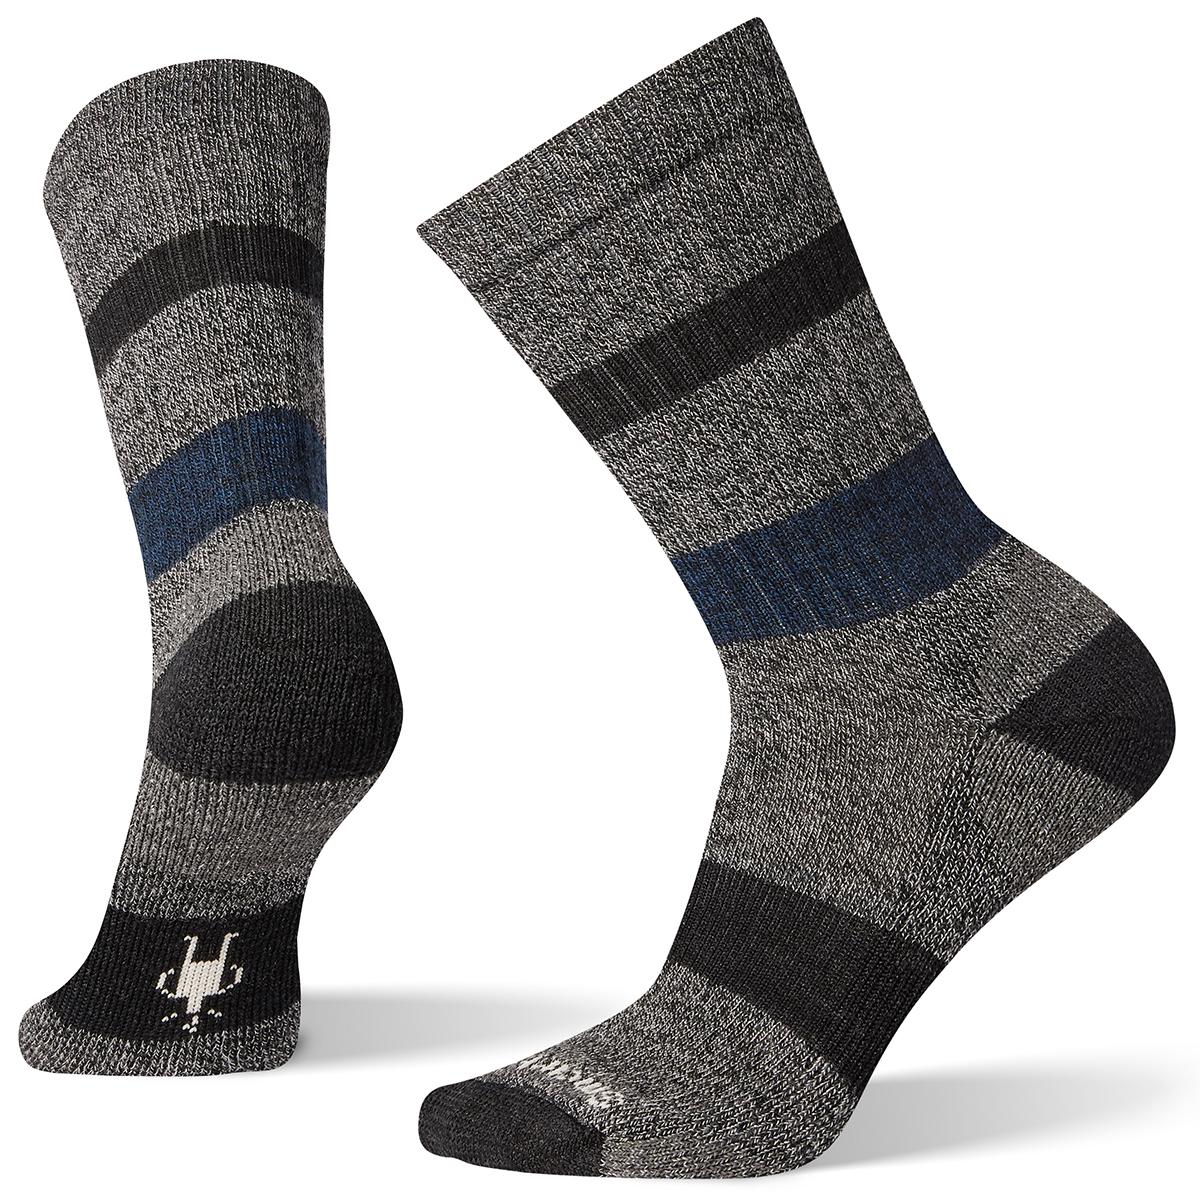 Smartwool Men's Barnsley Crew Socks - Black, L